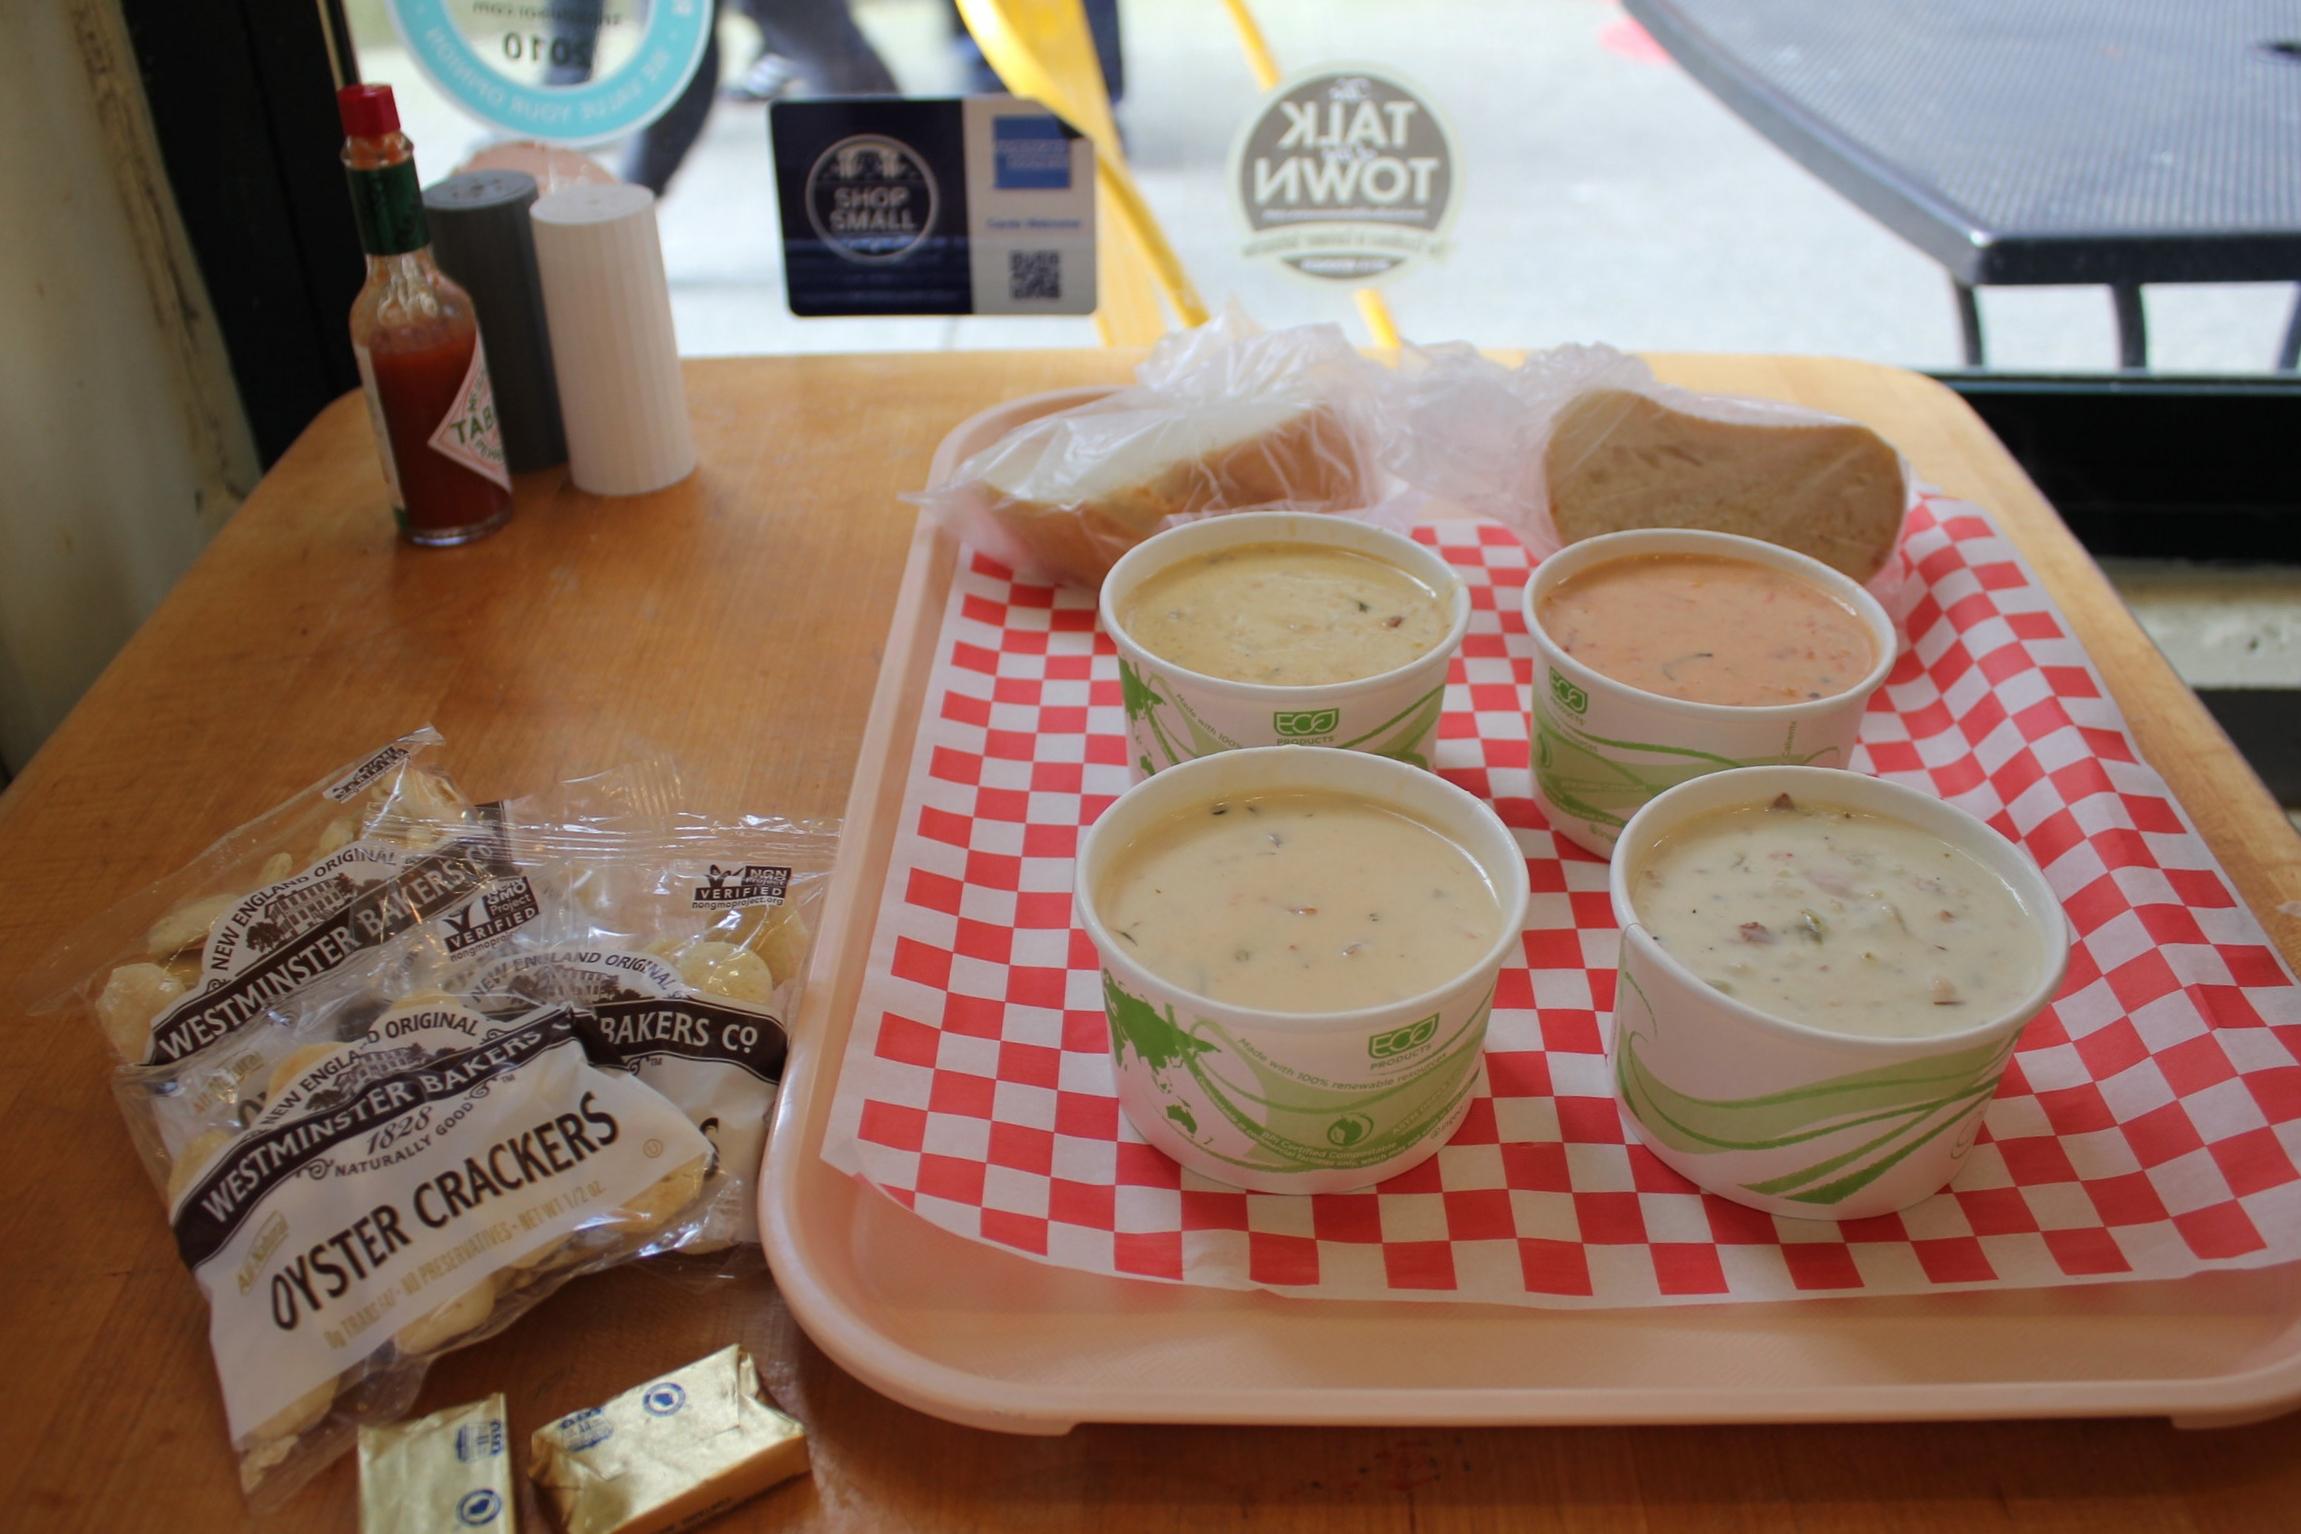 Pike Place Chowder – Chowder sampler